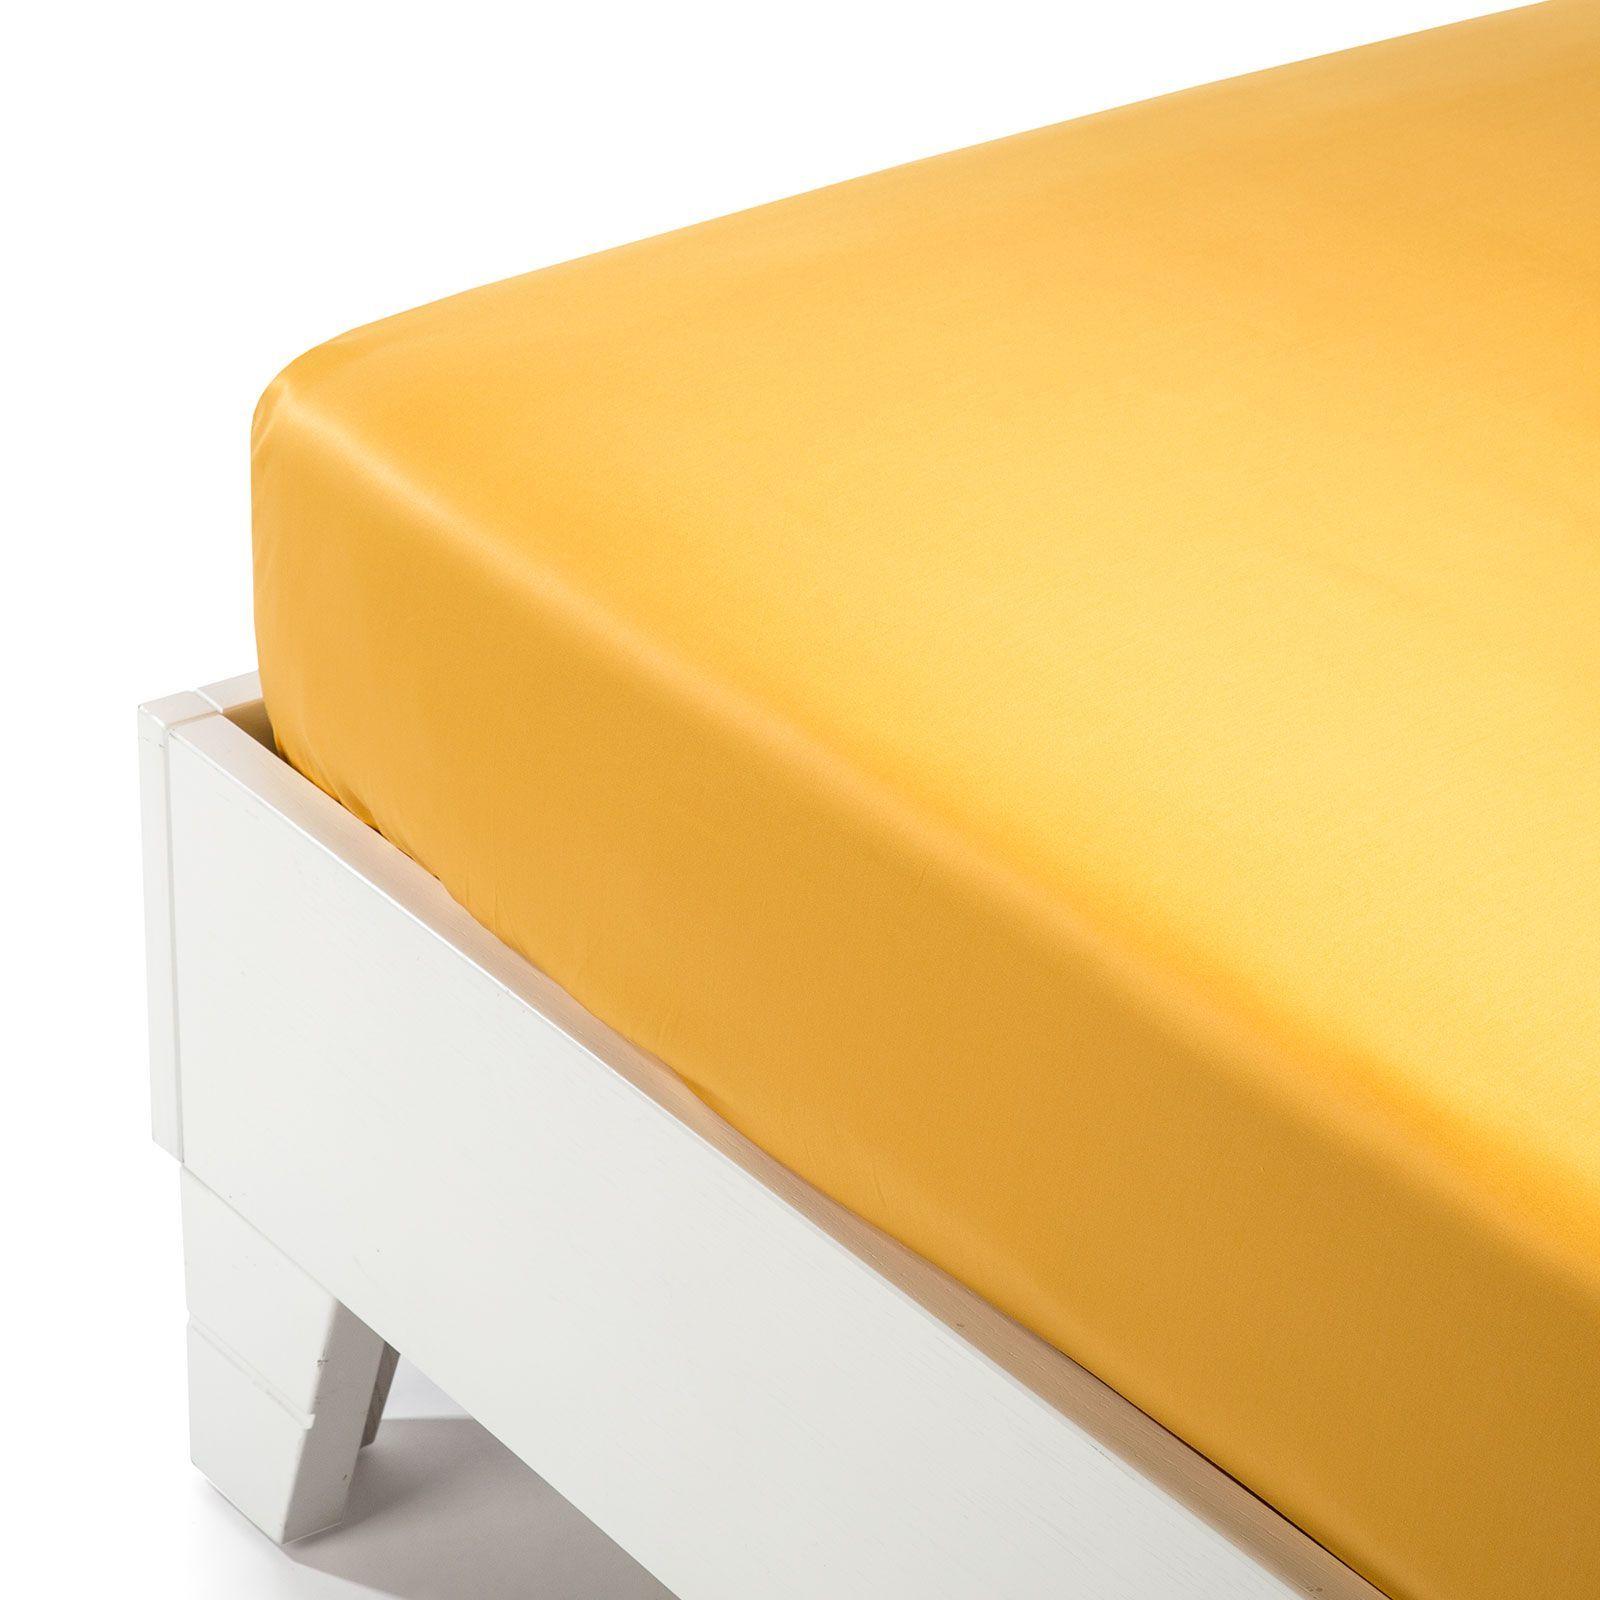 На резинке Простыня на резинке 160x200 Сaleffi Raso Tinta Unito с бордюром сатин золотая prostynya-na-rezinke-160x200-saleffi-raso-tinta-unito-s-bordyurom-satin-oro-italiya.jpg